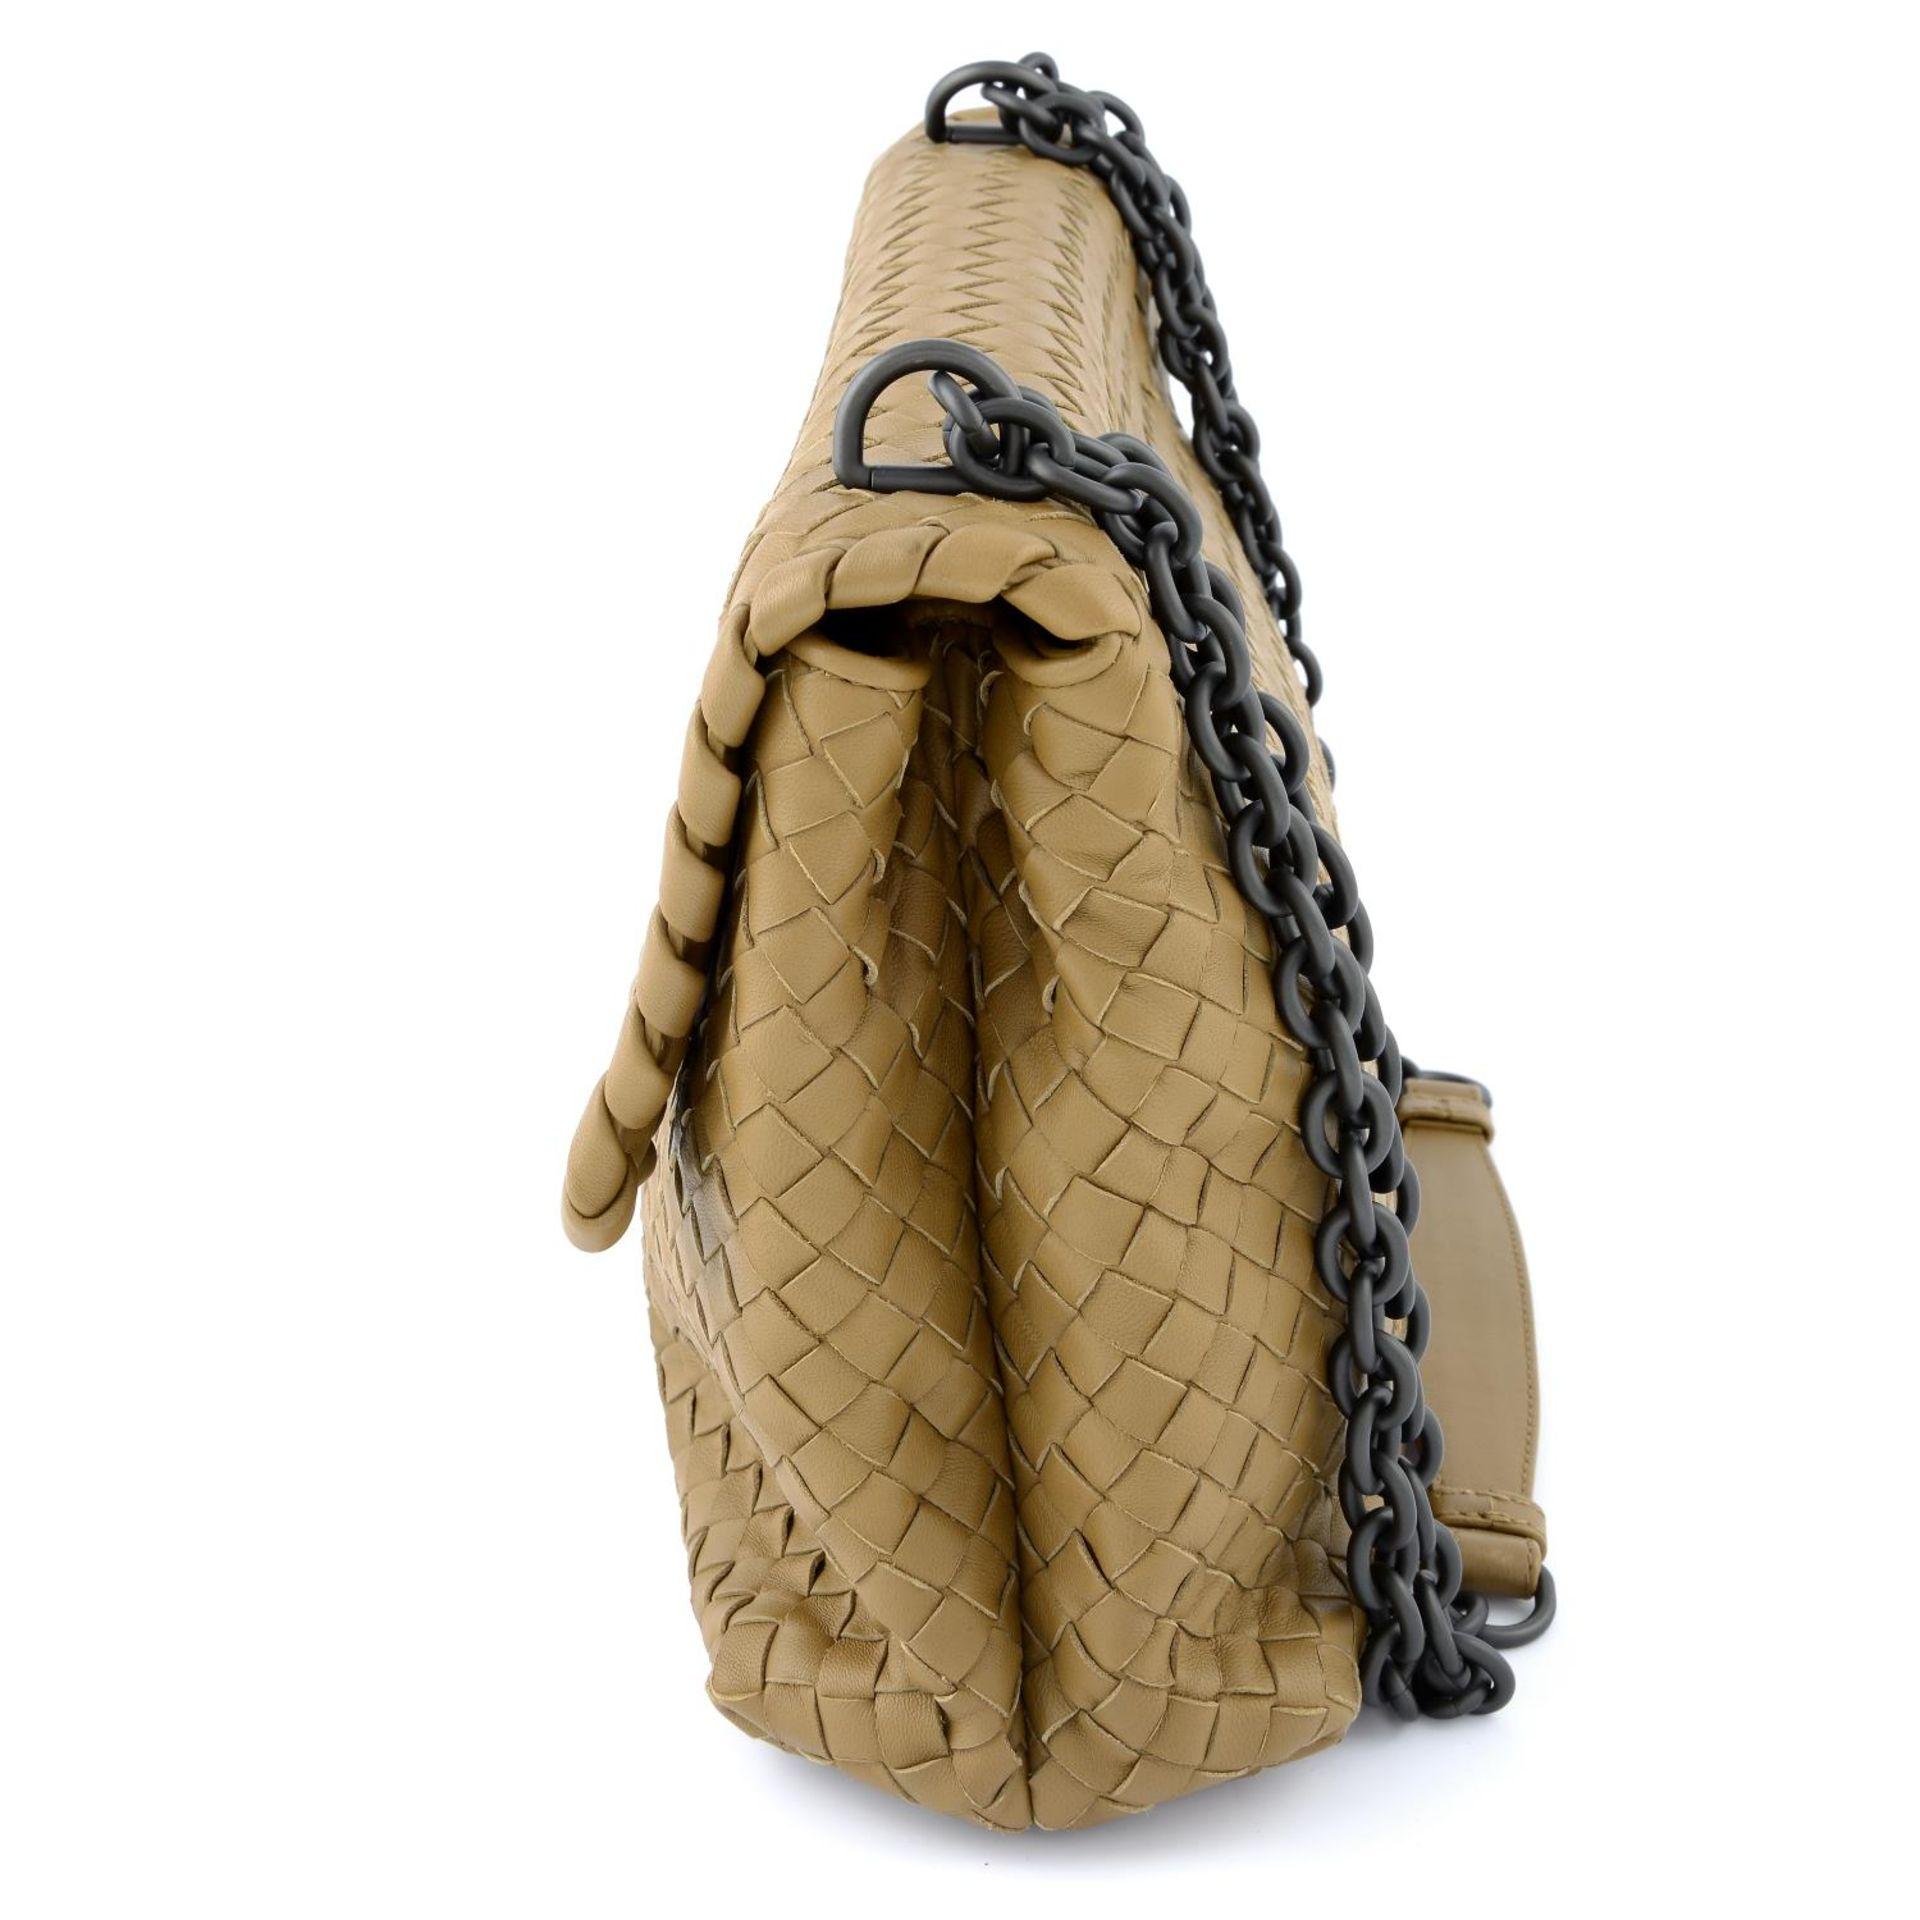 BOTTEGA VENETA - a fold over Intrecciato handbag. - Image 3 of 5